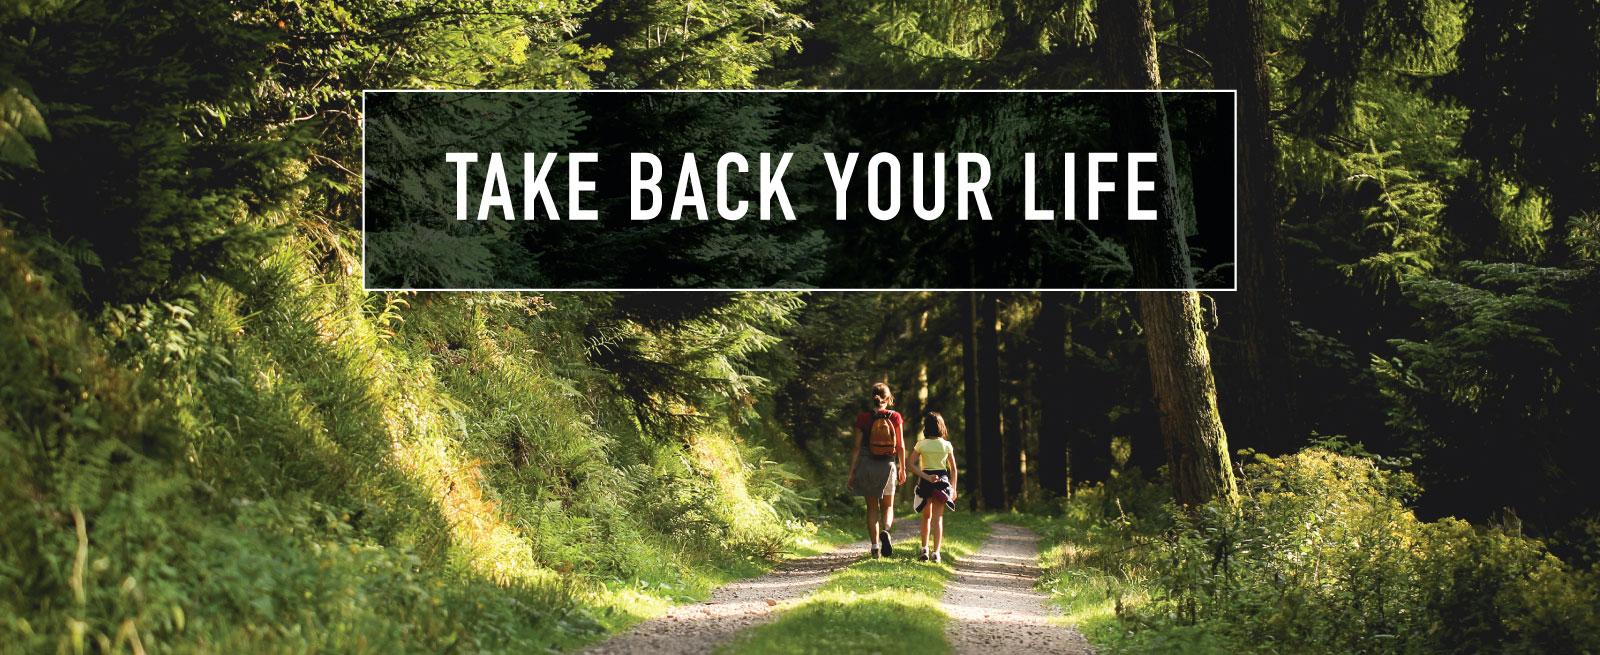 Take-Back-Your-Life-1.jpg